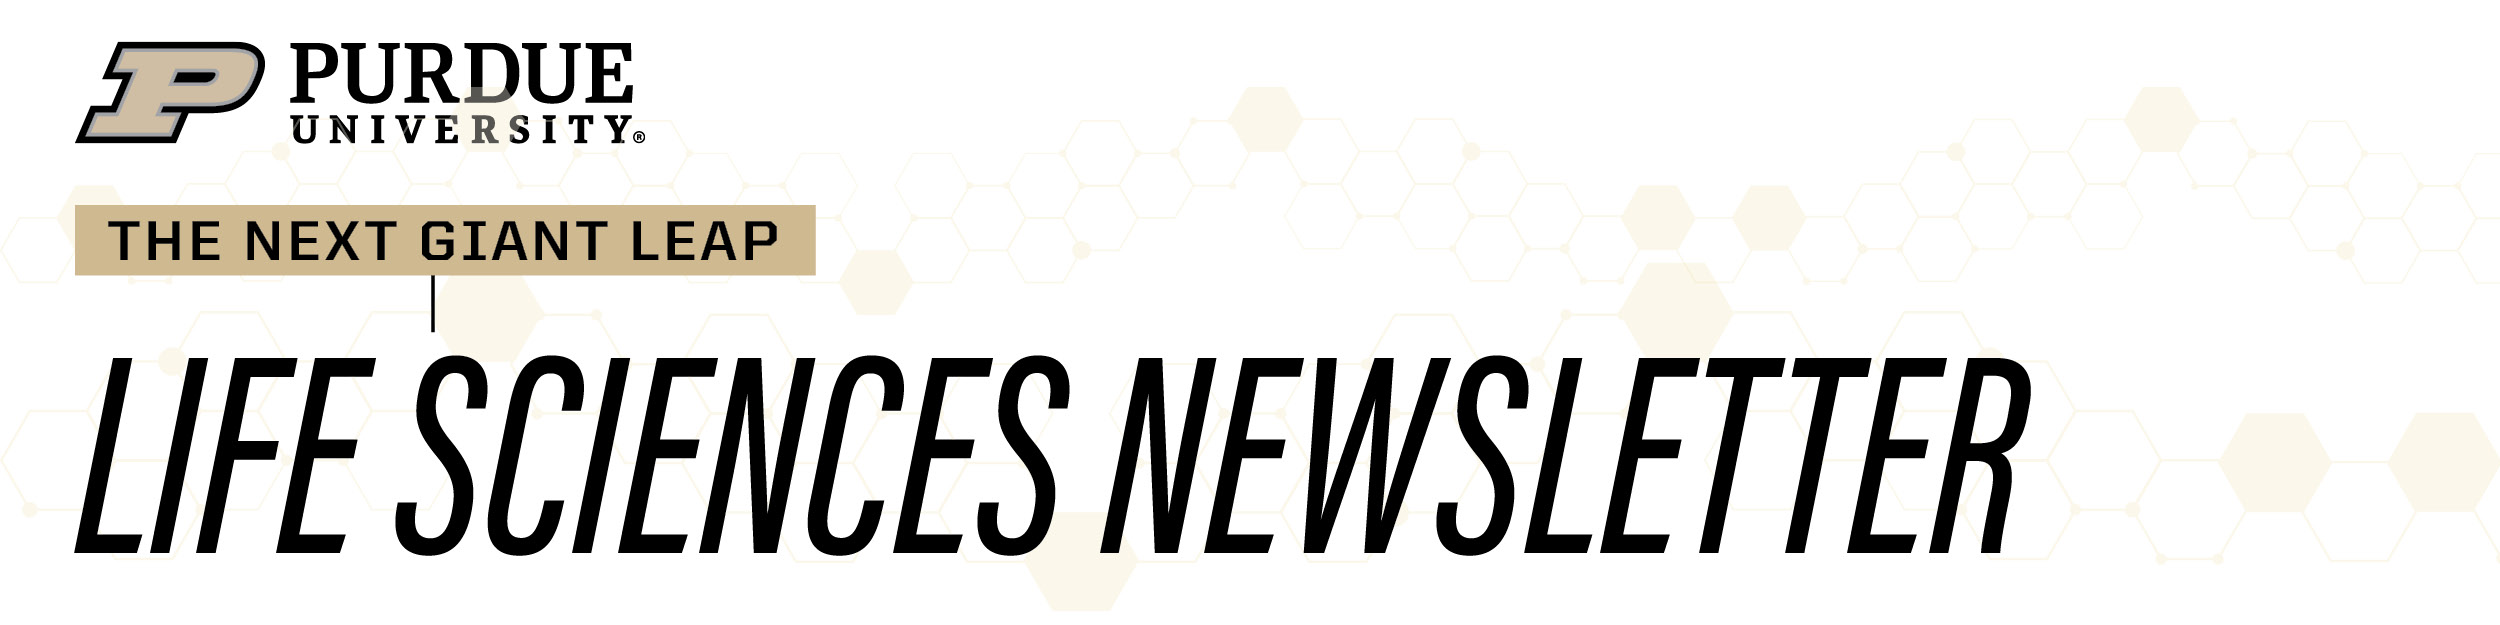 Purdue Life Sciences News